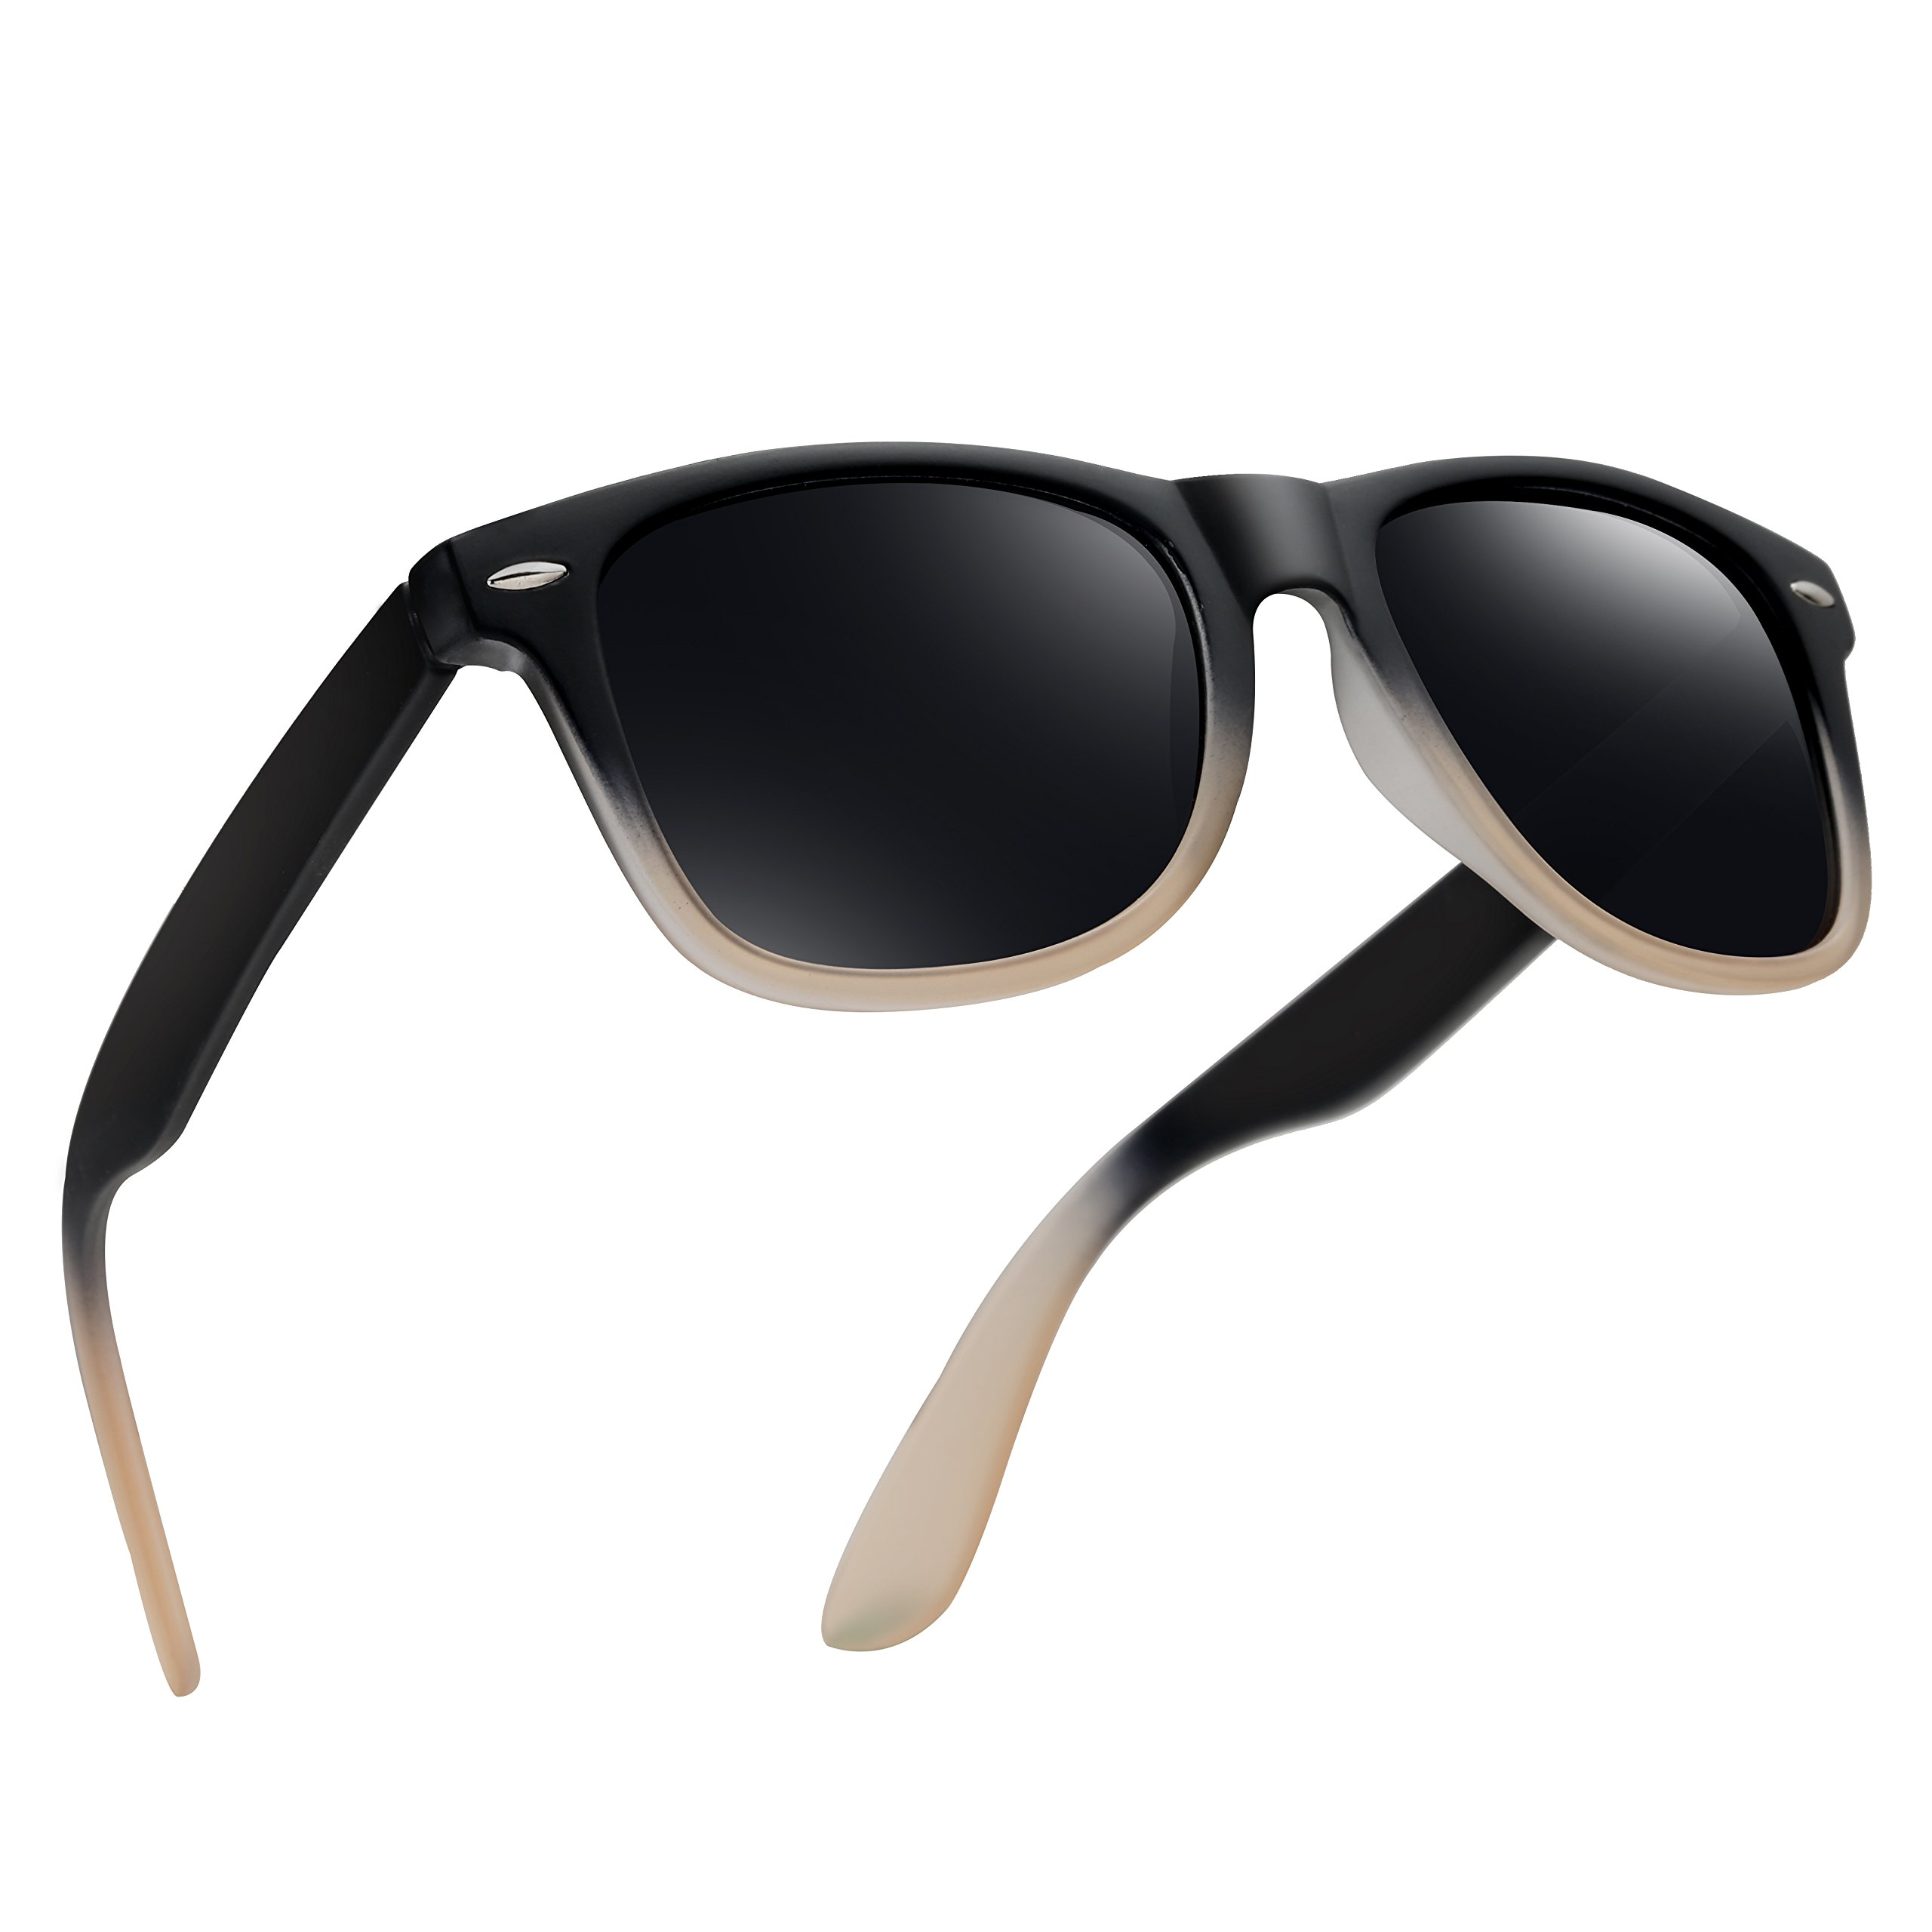 c5cd2a2e9a4 Sunglasses for Men Vintage Polarized Sun Glasses Shades WP1001-2. by wearpro